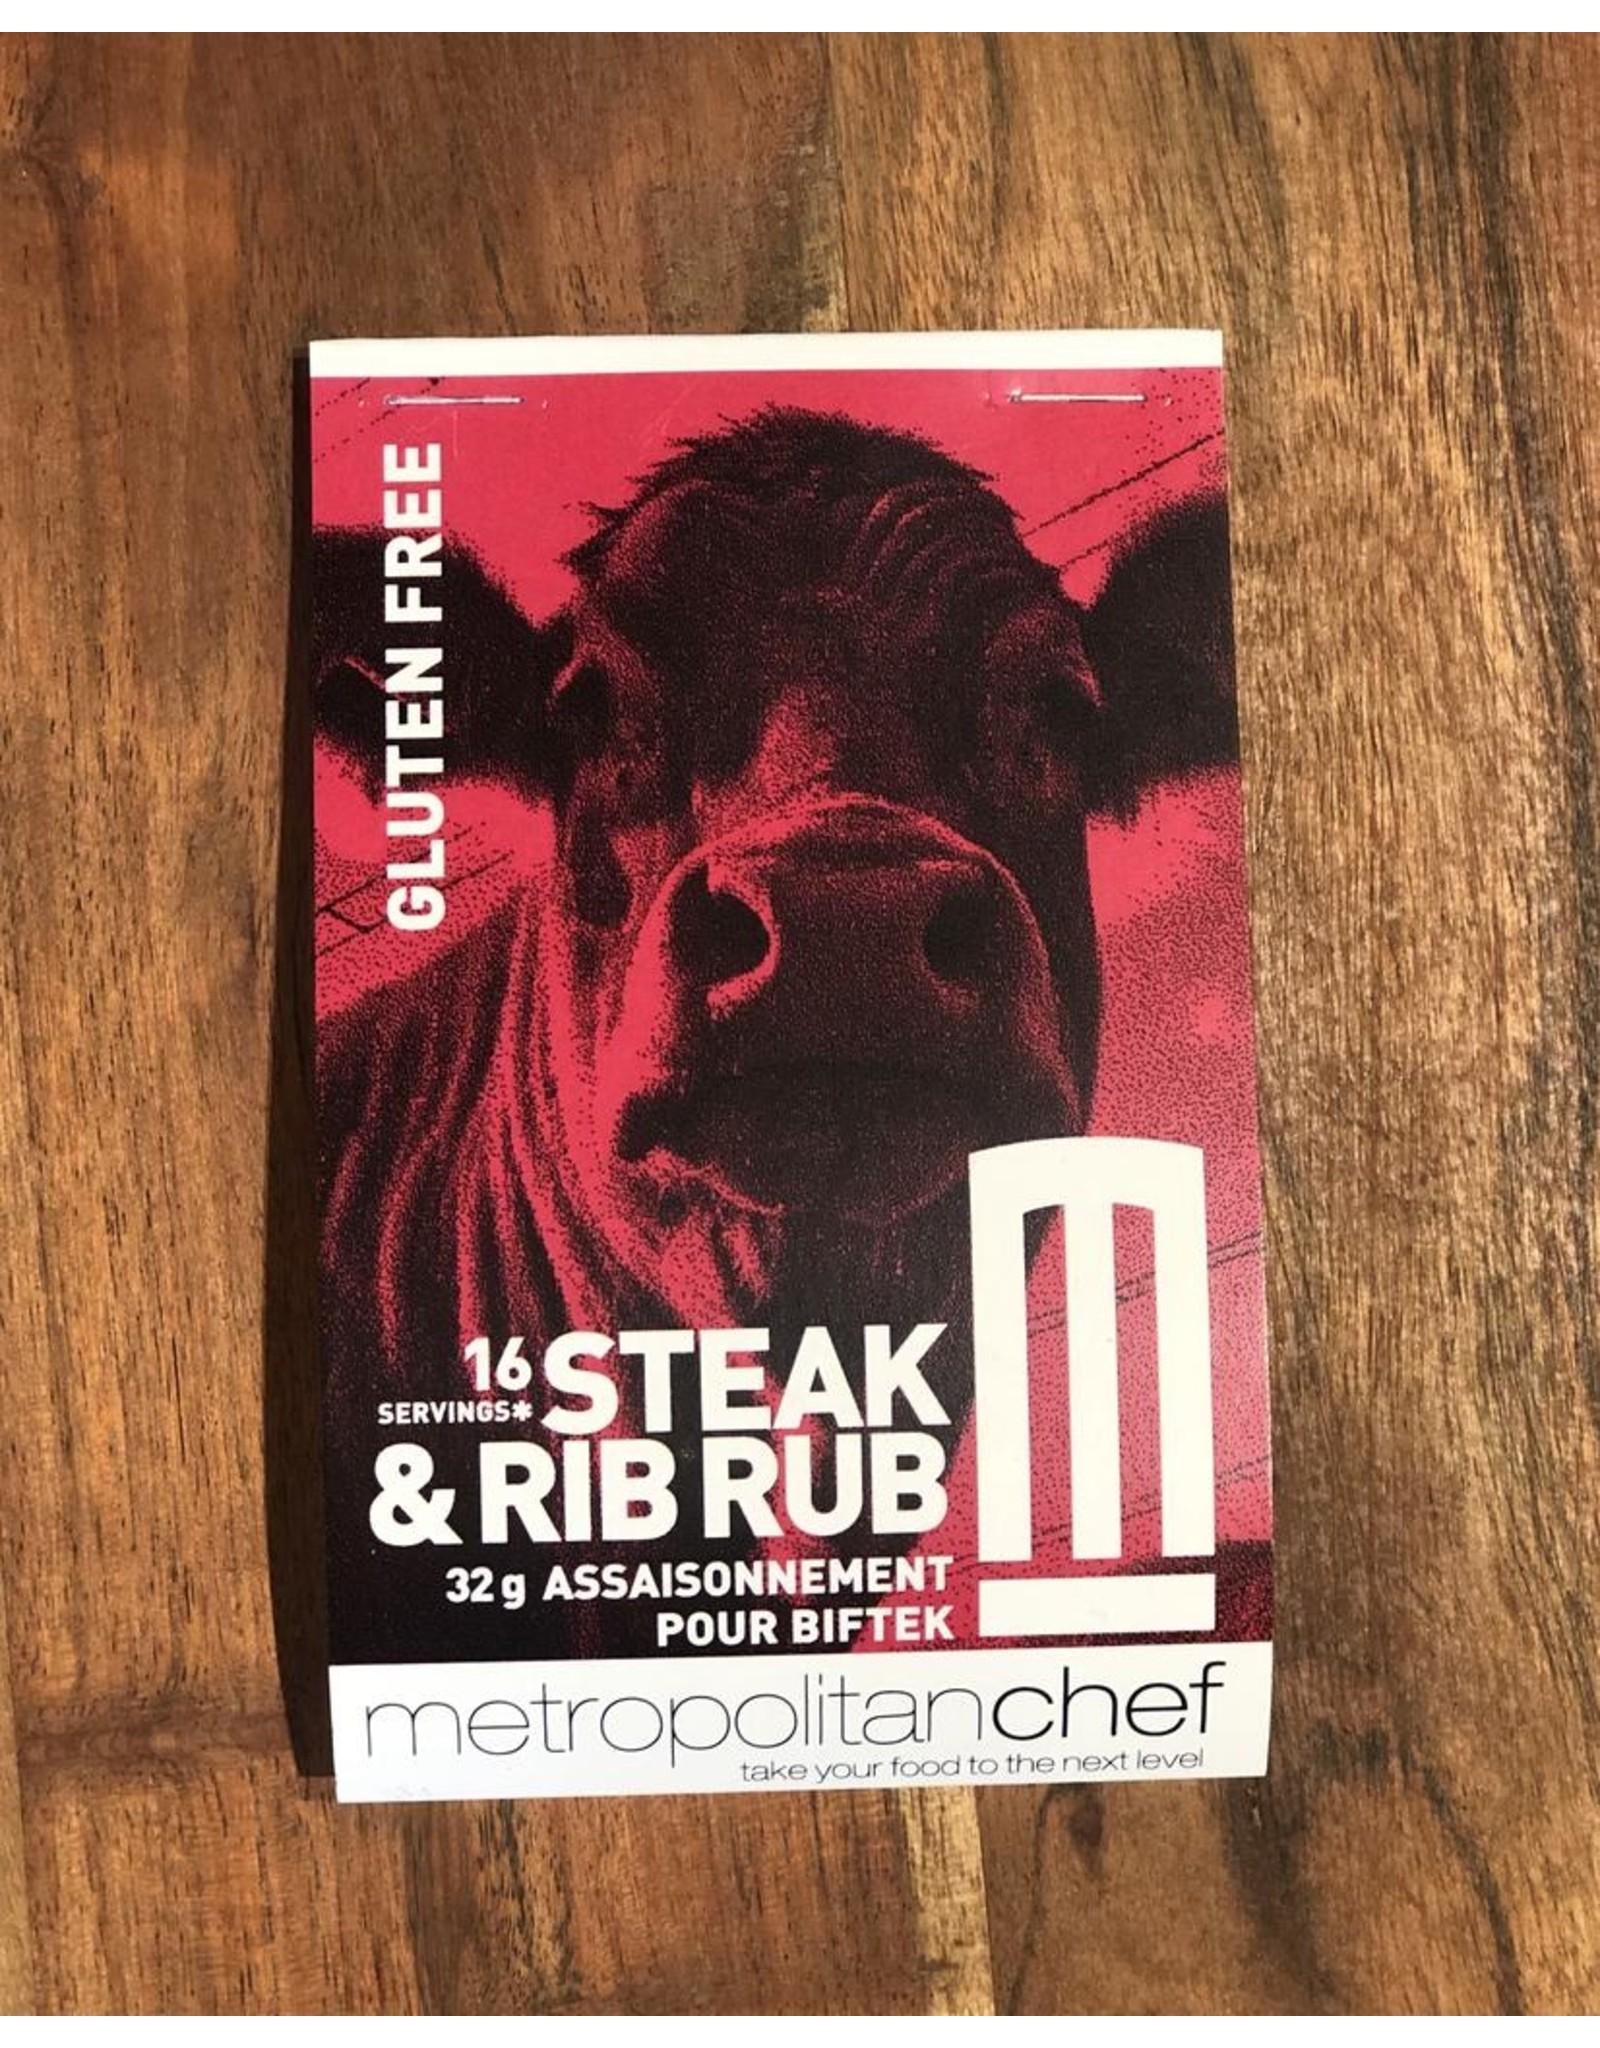 Metropolitan Chef Steak and Rib Rub 24g